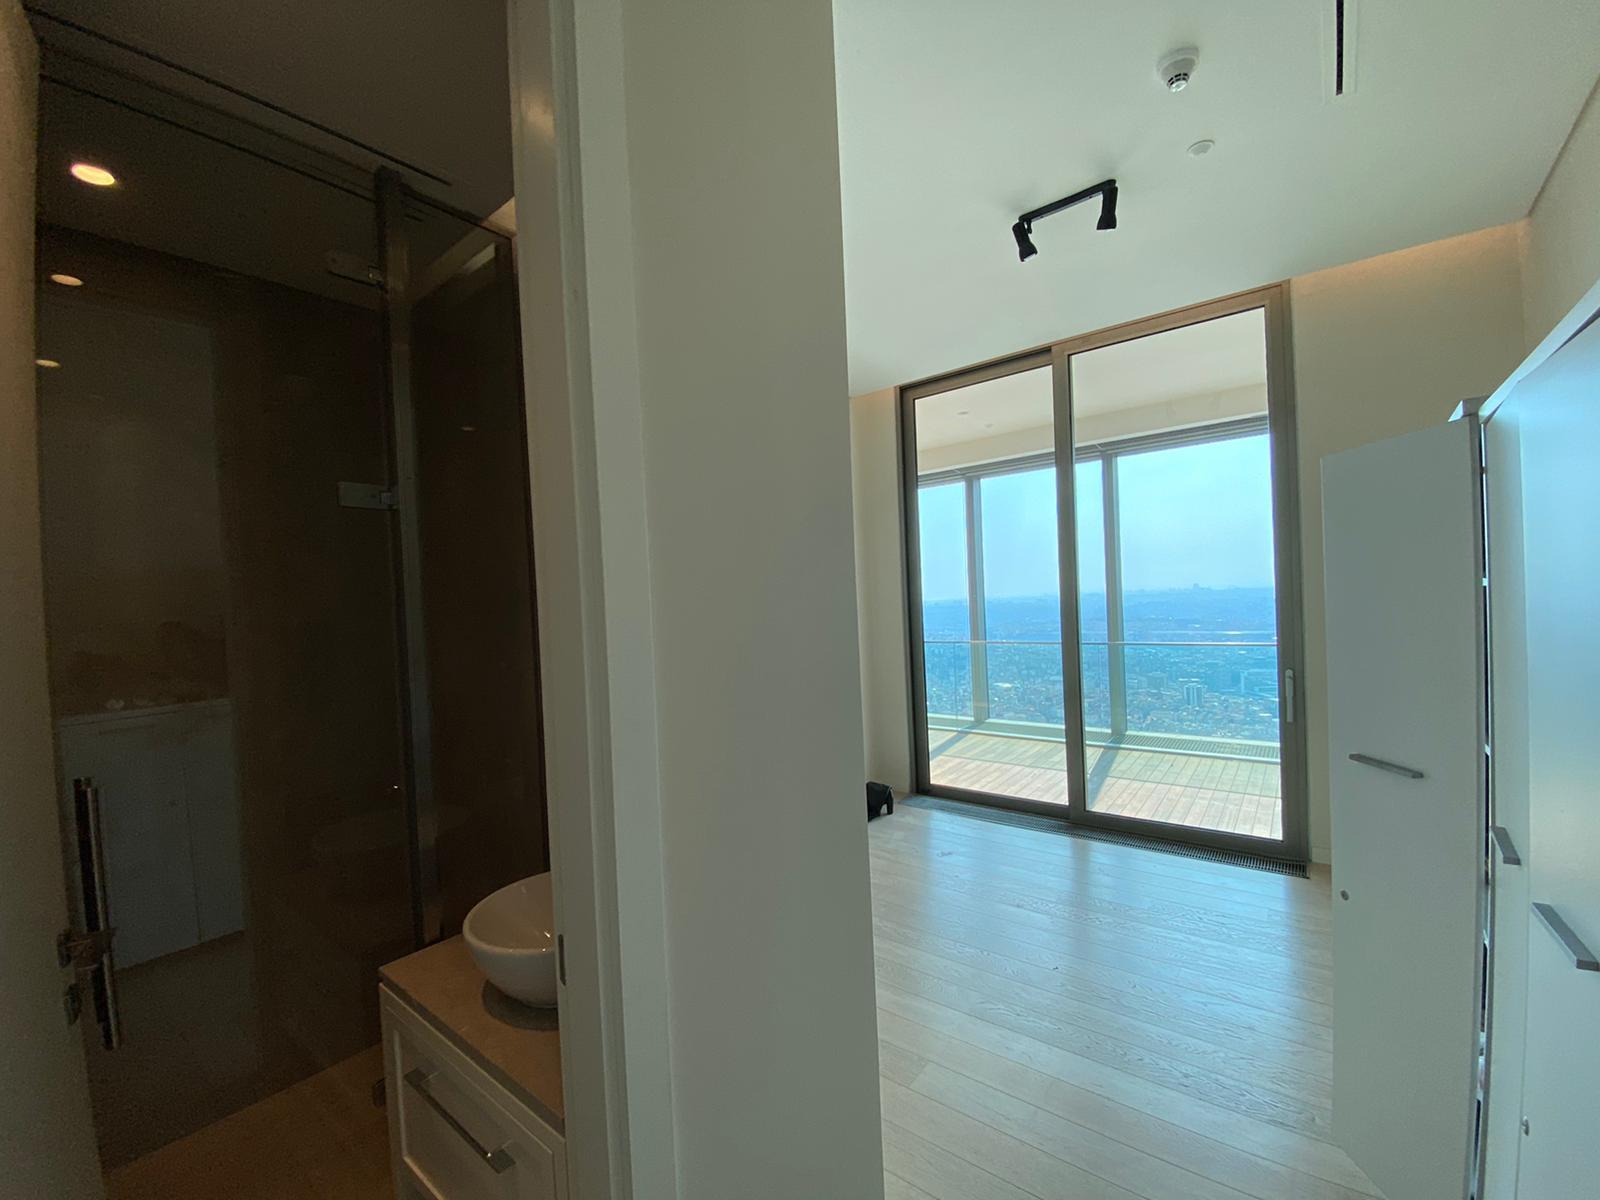 penthouse-istanbul-sapphire-tower-42th-floor-023.jpg